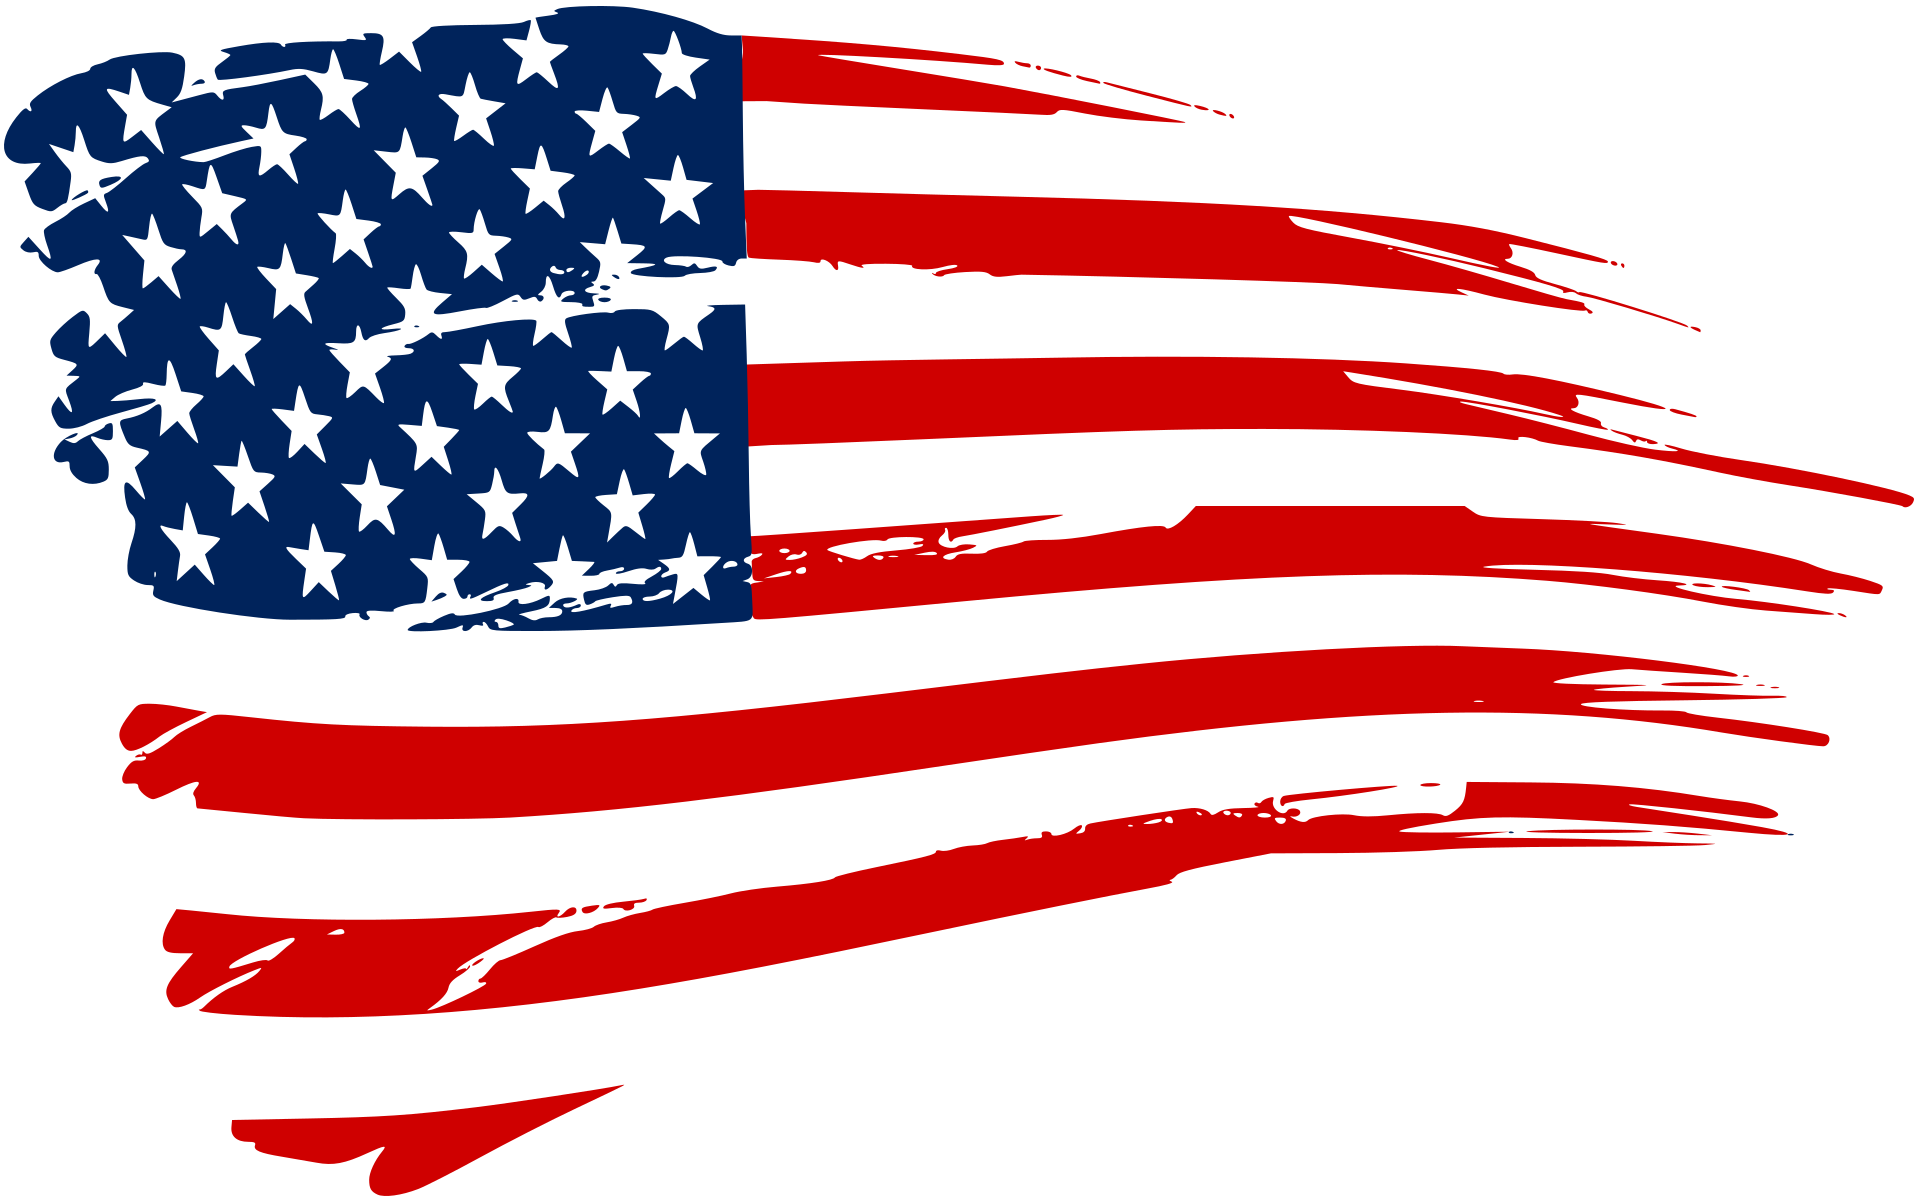 American flag flaming - /scenic/wallpaper/patriotic/American_flag_flaming. png.html - American Flag PNG Transparent